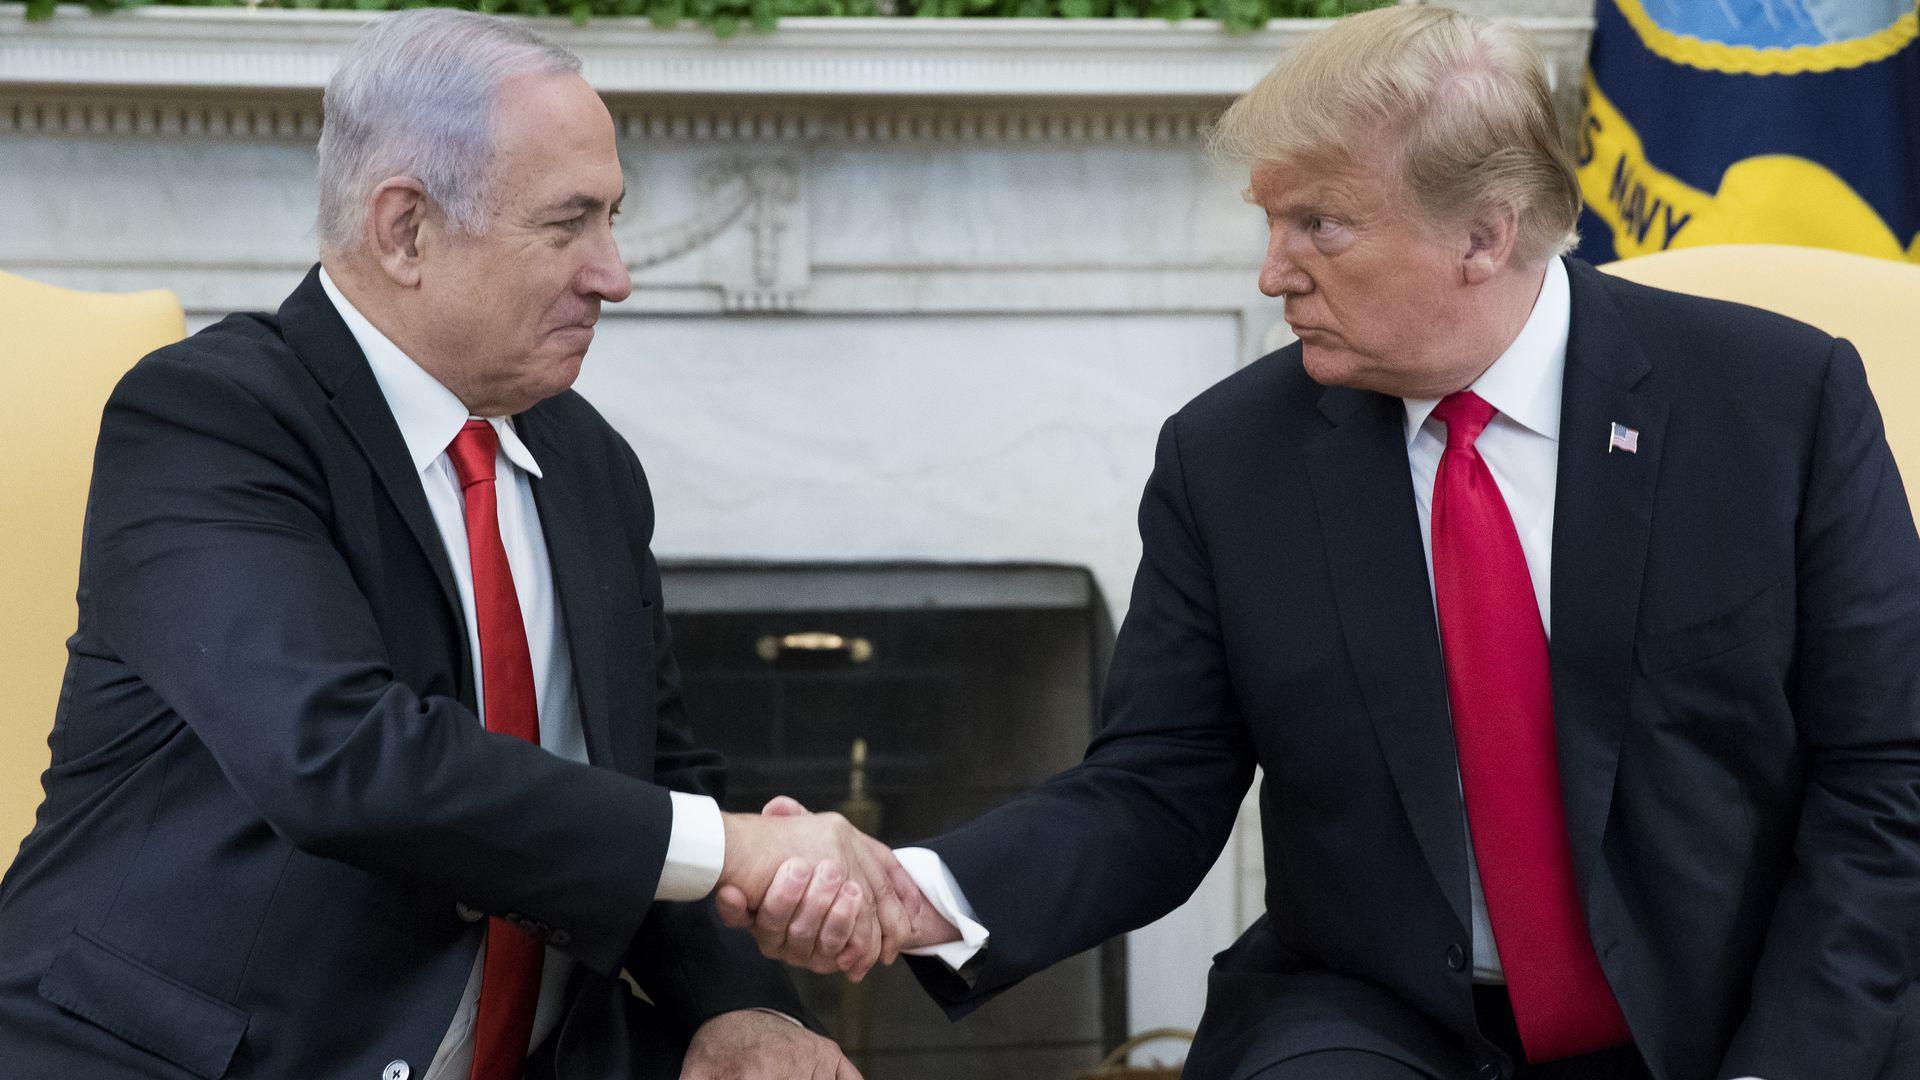 Israel's Netanyahu unveils 'Trump Heights' settlement in the Golan